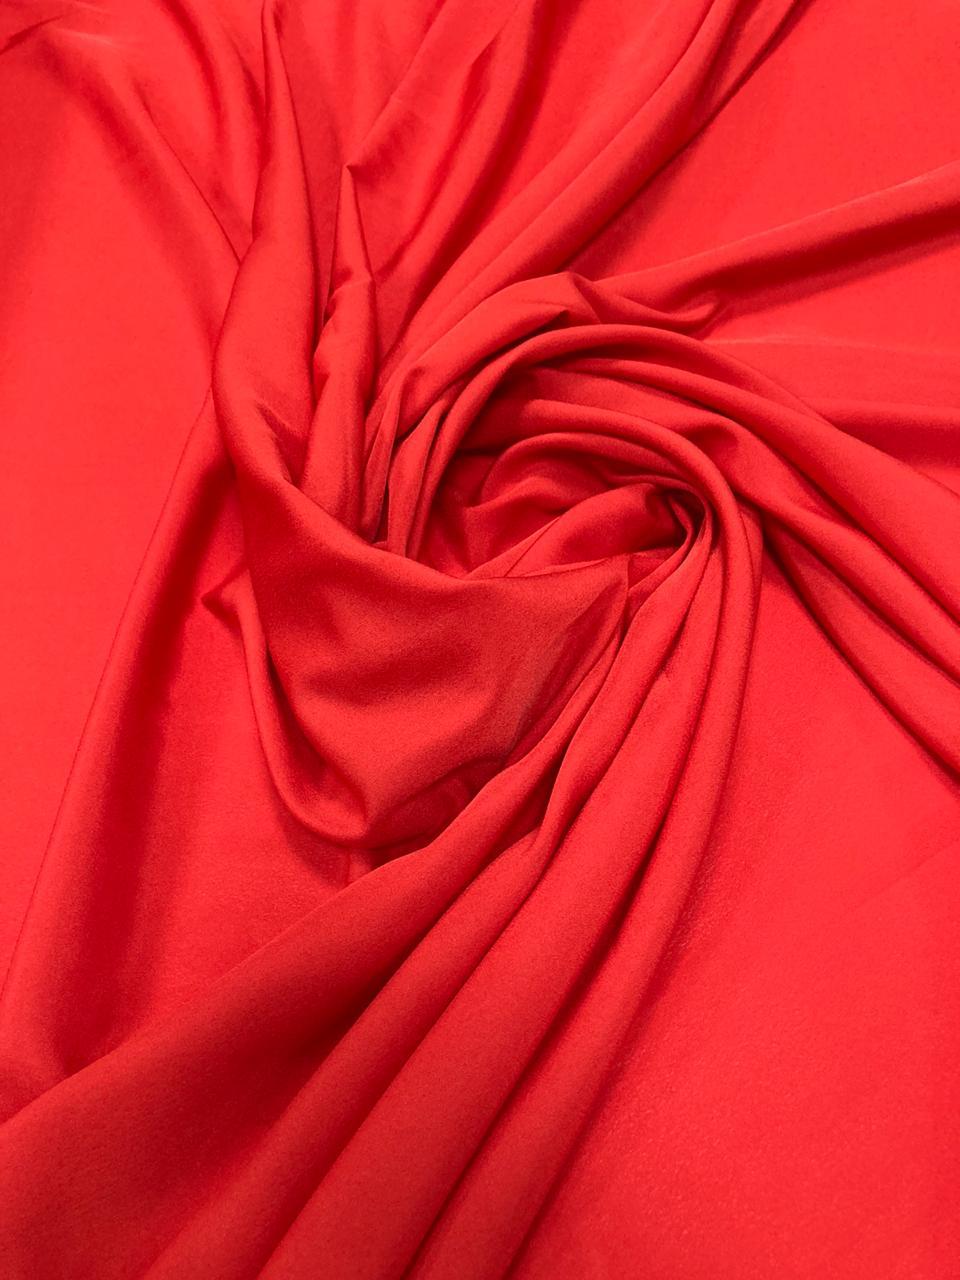 Crepe Haya Liso Vermelho